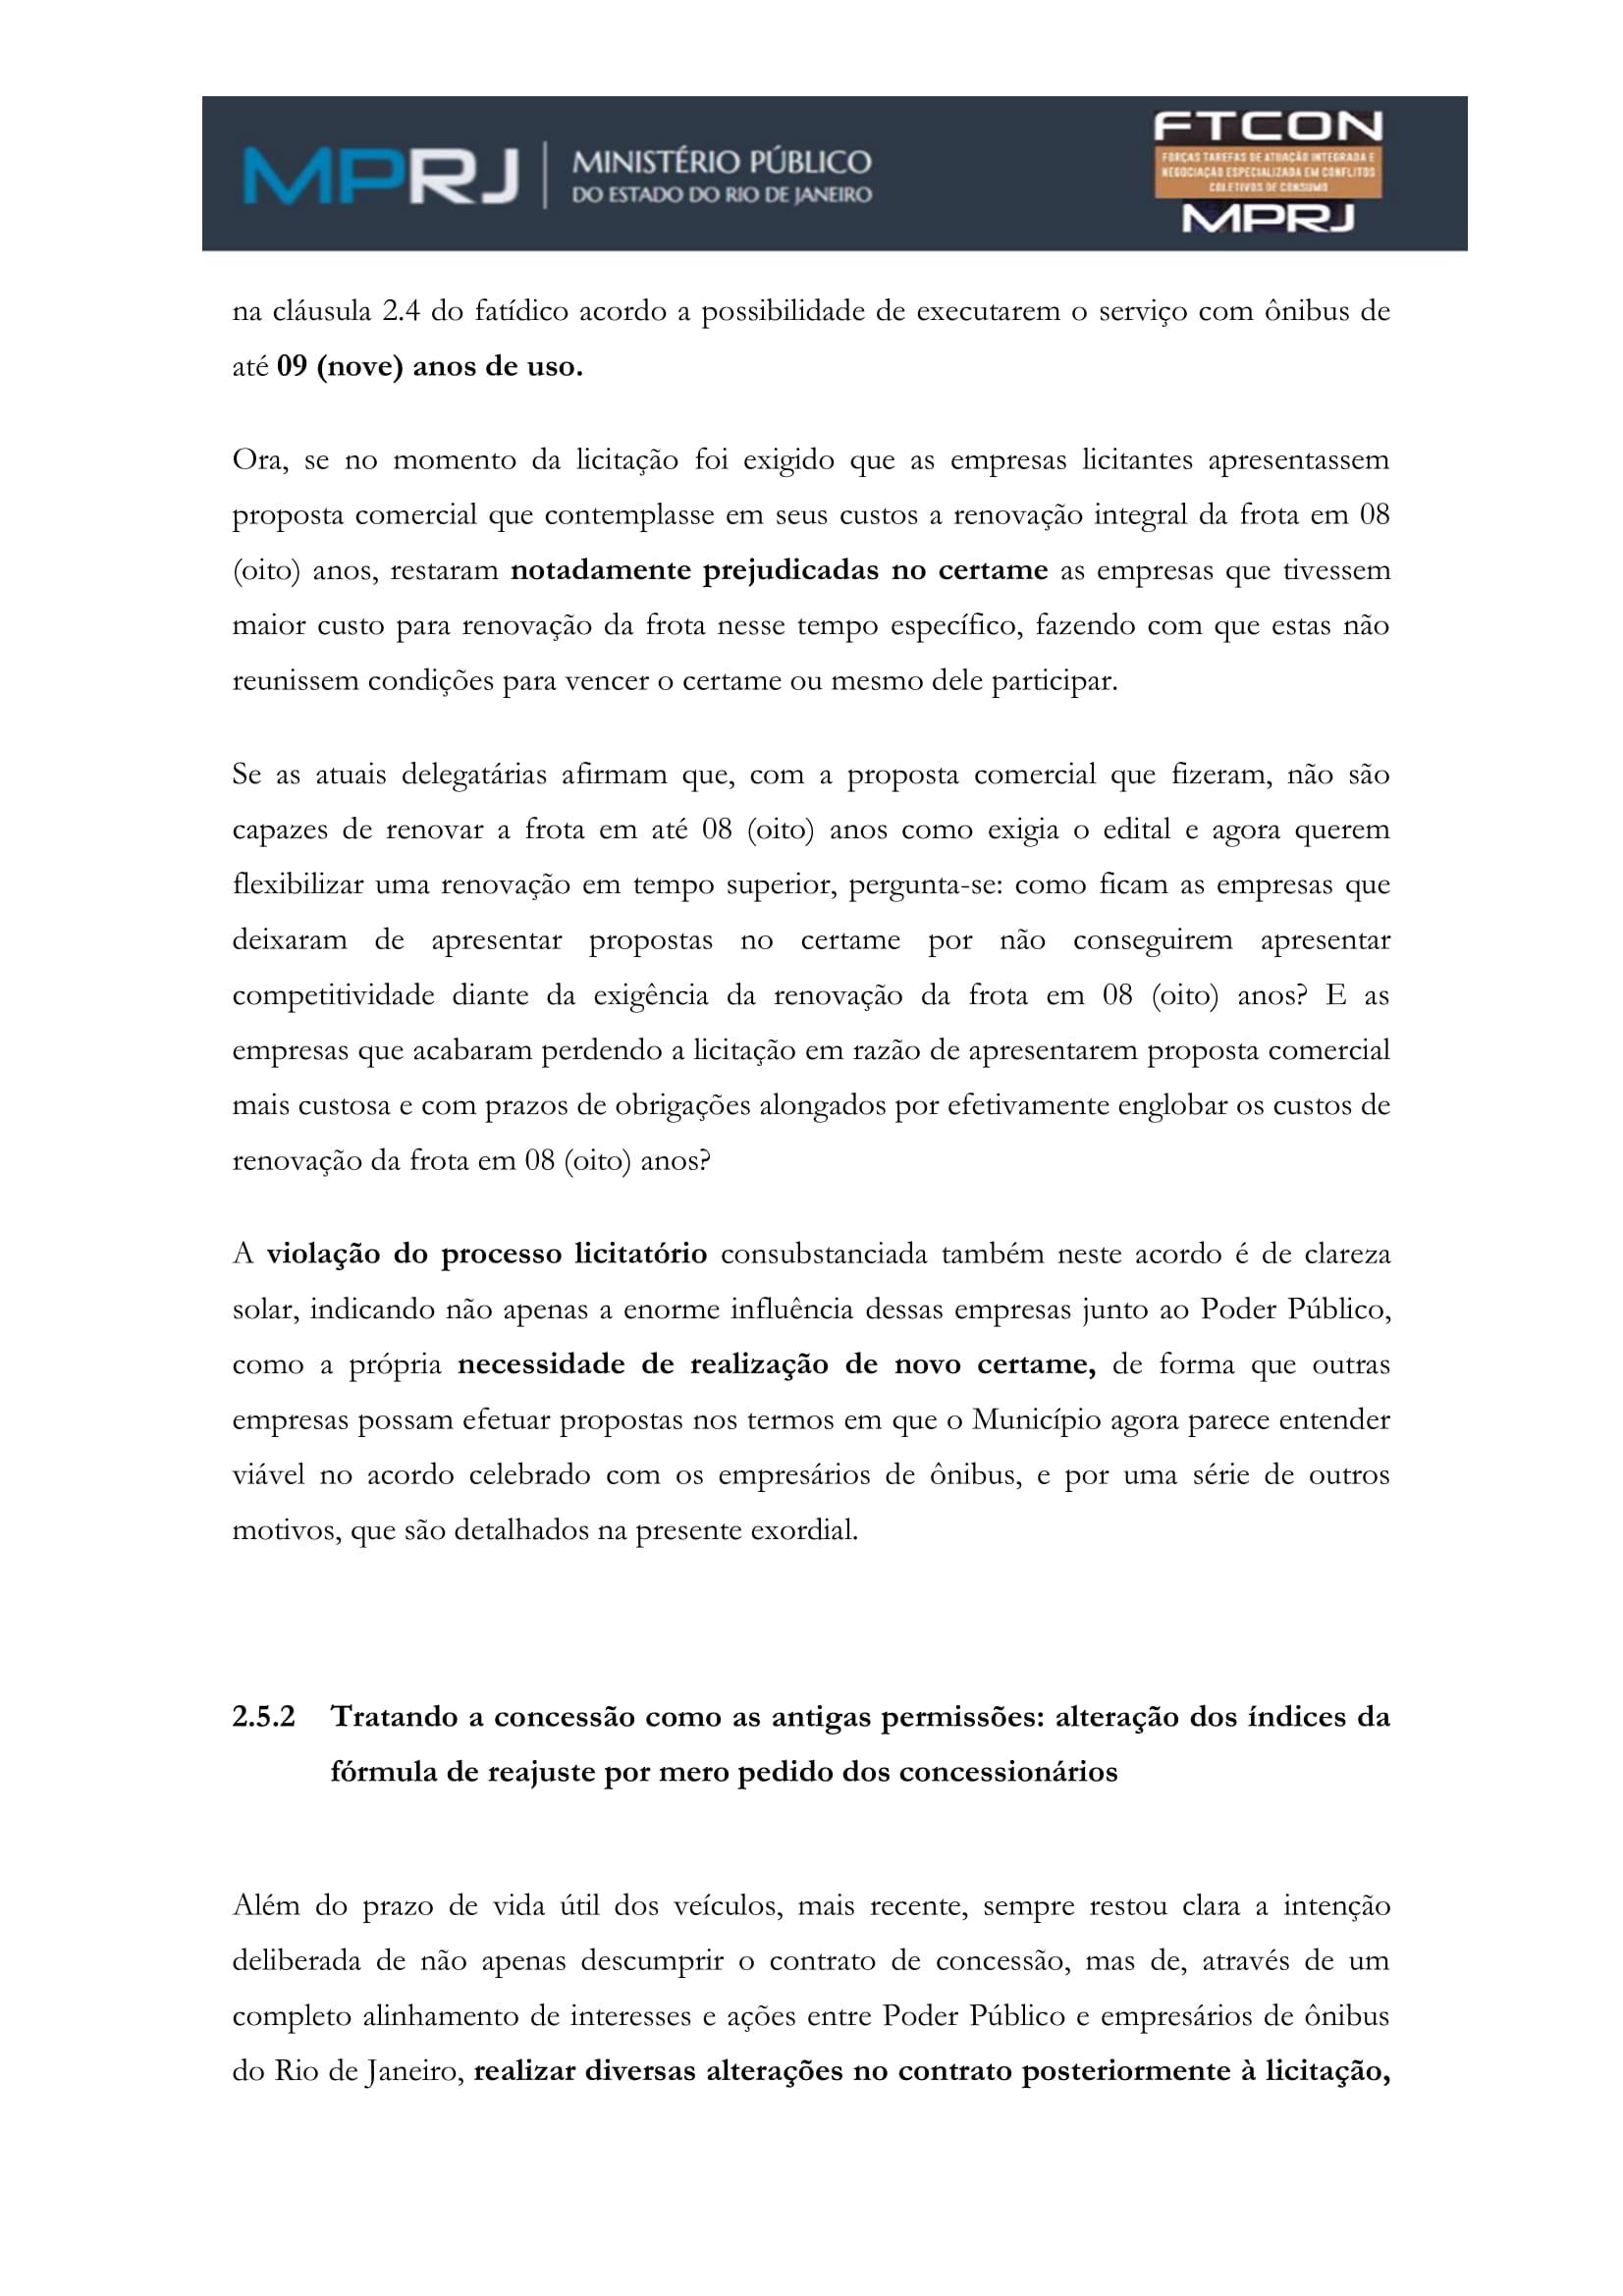 acp_caducidade_onibus_dr_rt-055